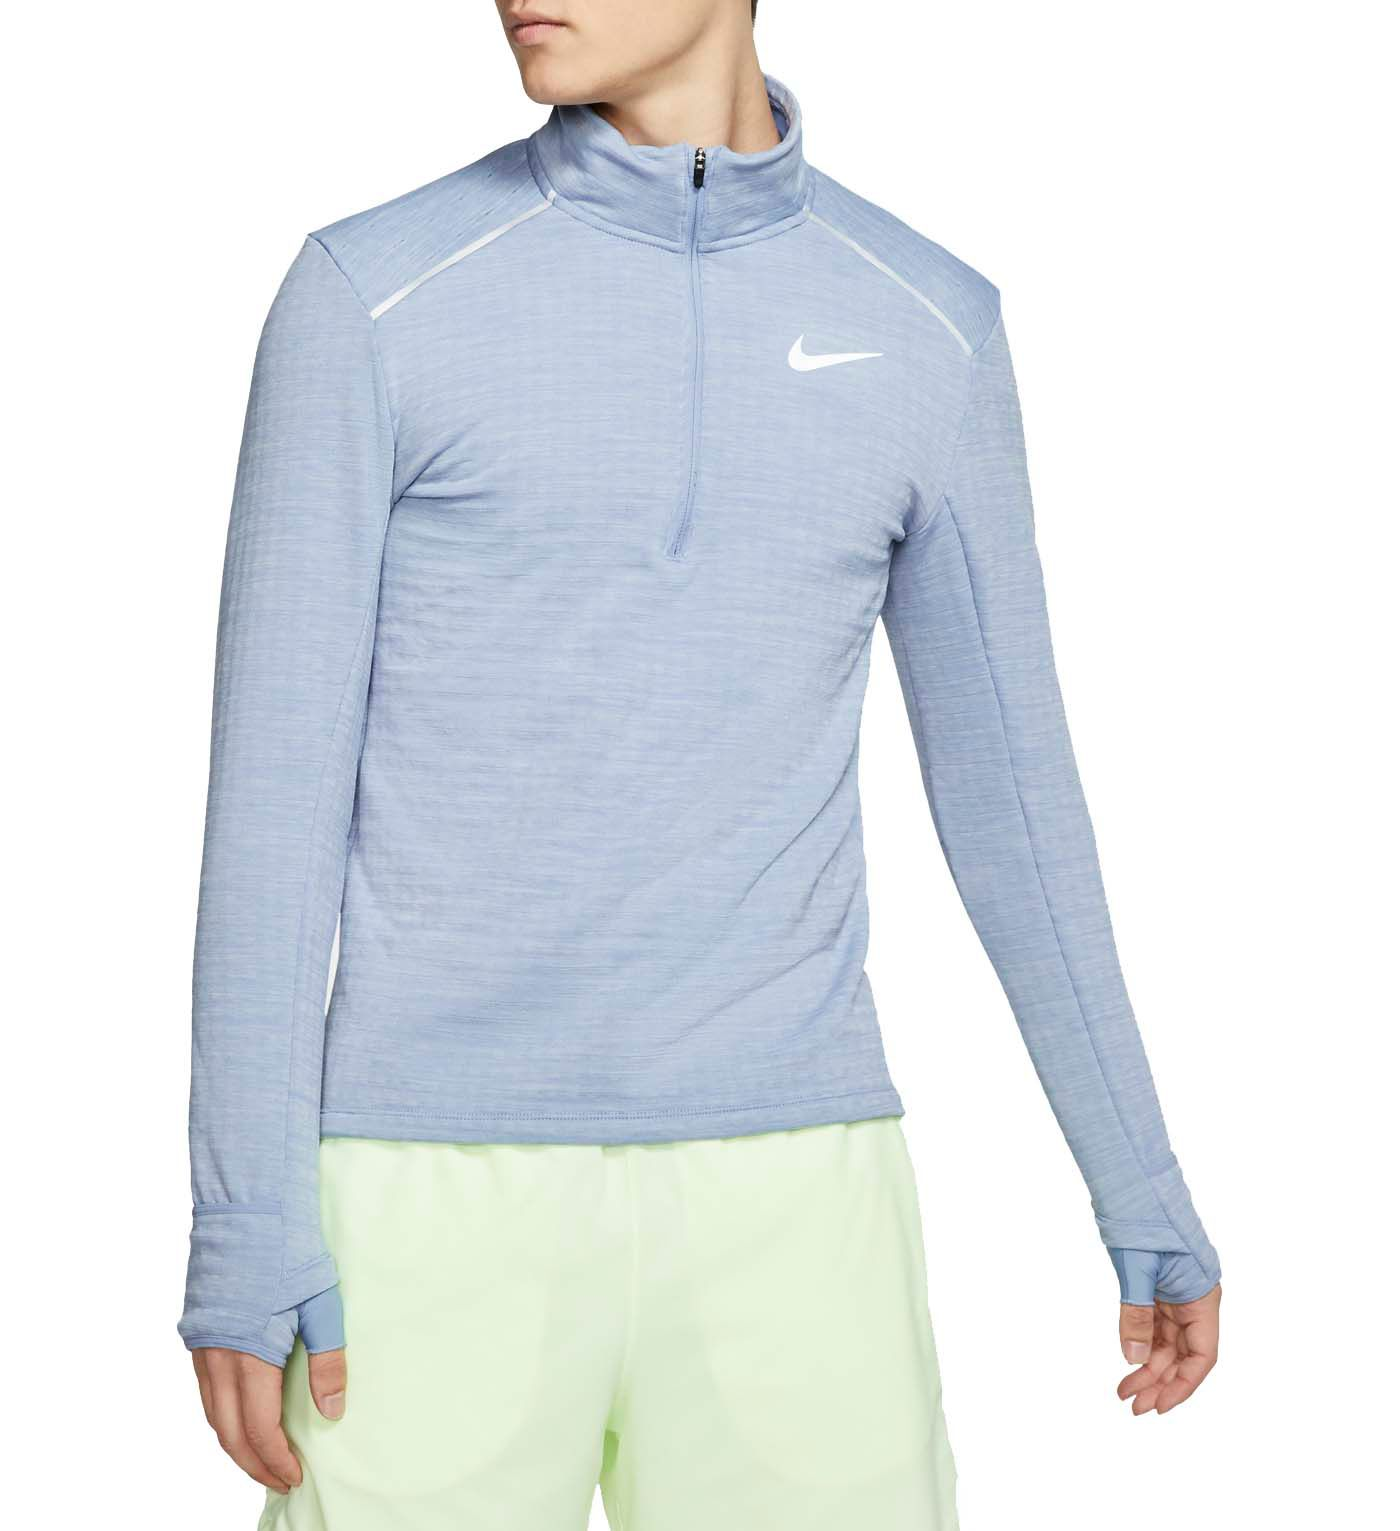 Nike Men's Therma Sphere Element ½ Zip Running Long Sleeve Shirt 3.0